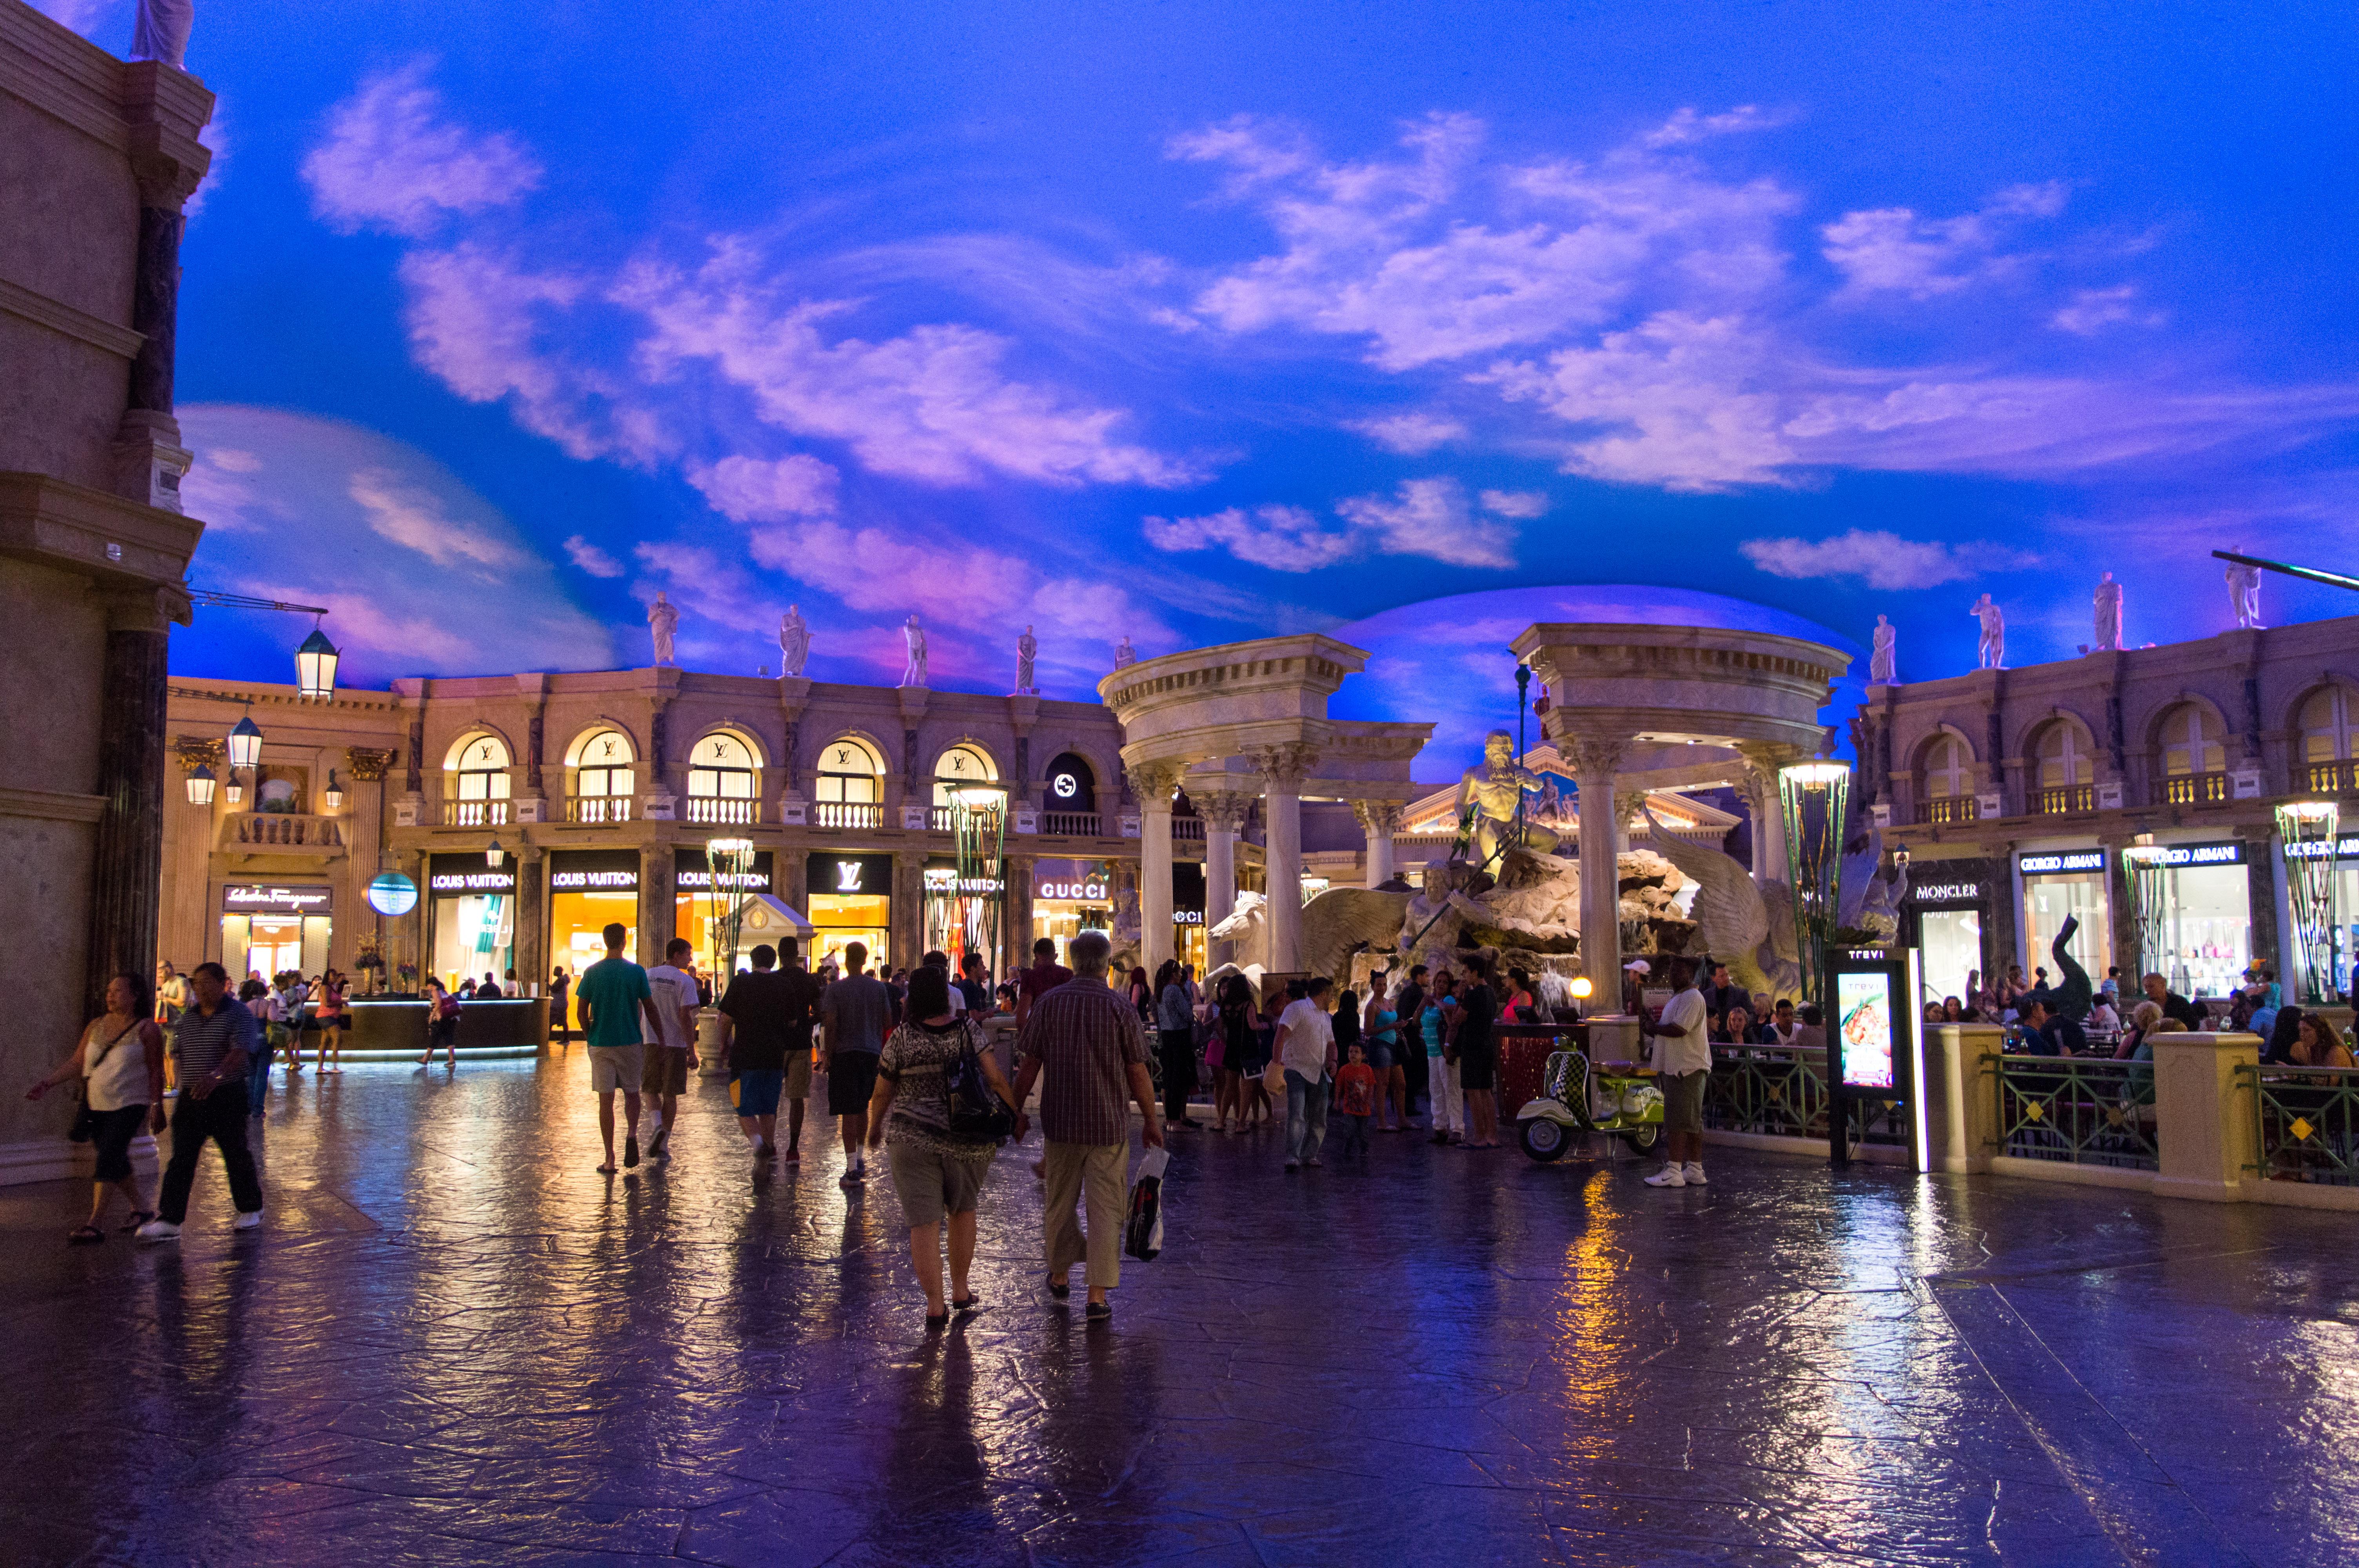 File:Fountain of the Gods, Caesars Palace (Las Vegas) (3 ...